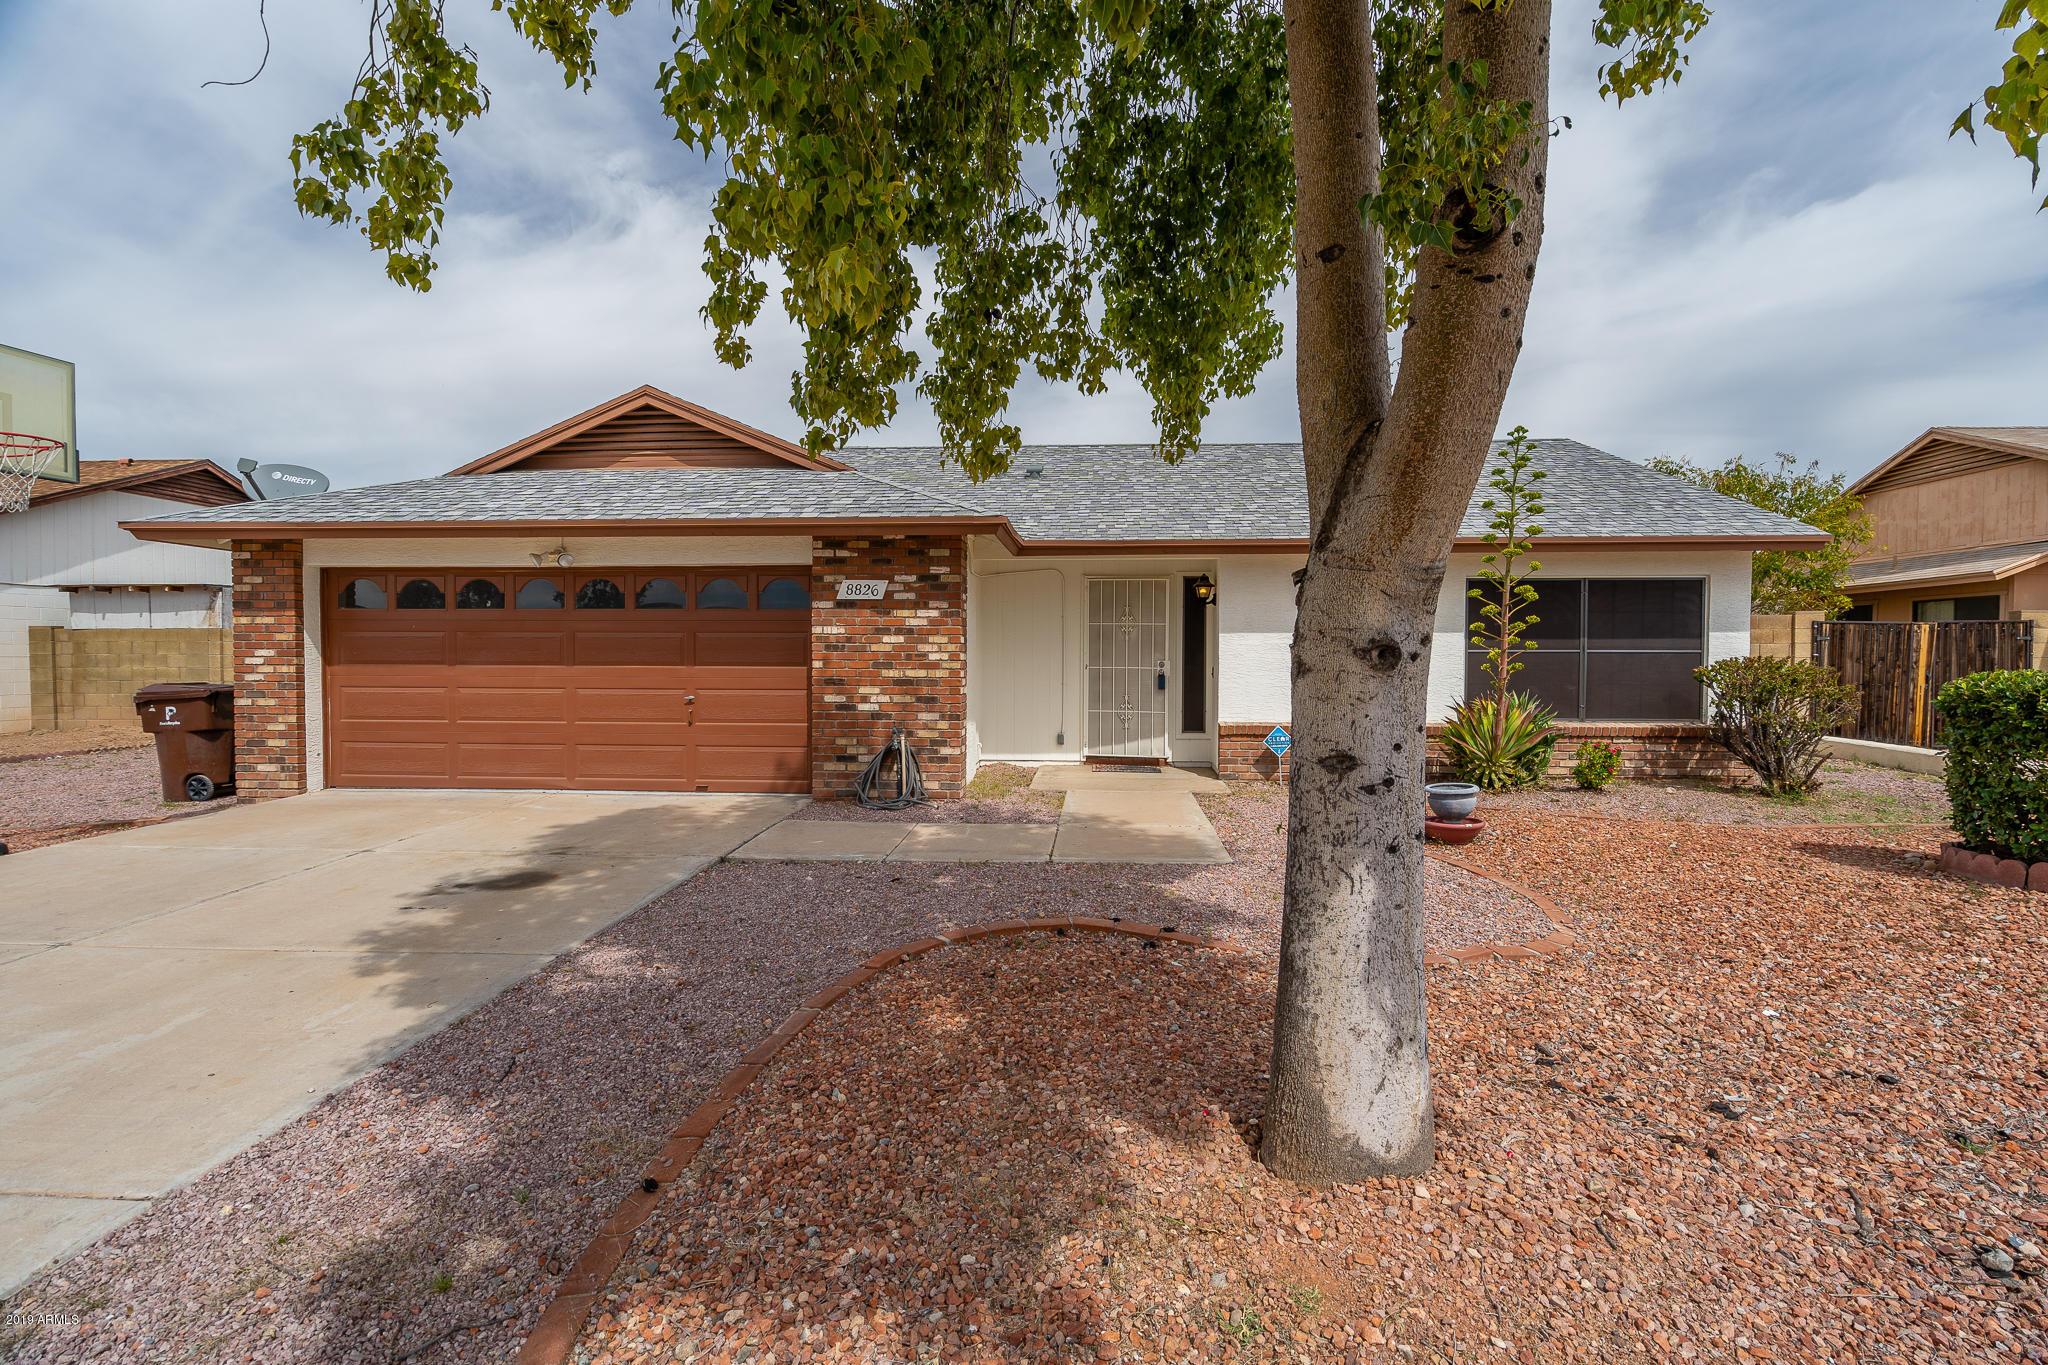 Photo of 8826 W DIANA Avenue, Peoria, AZ 85345